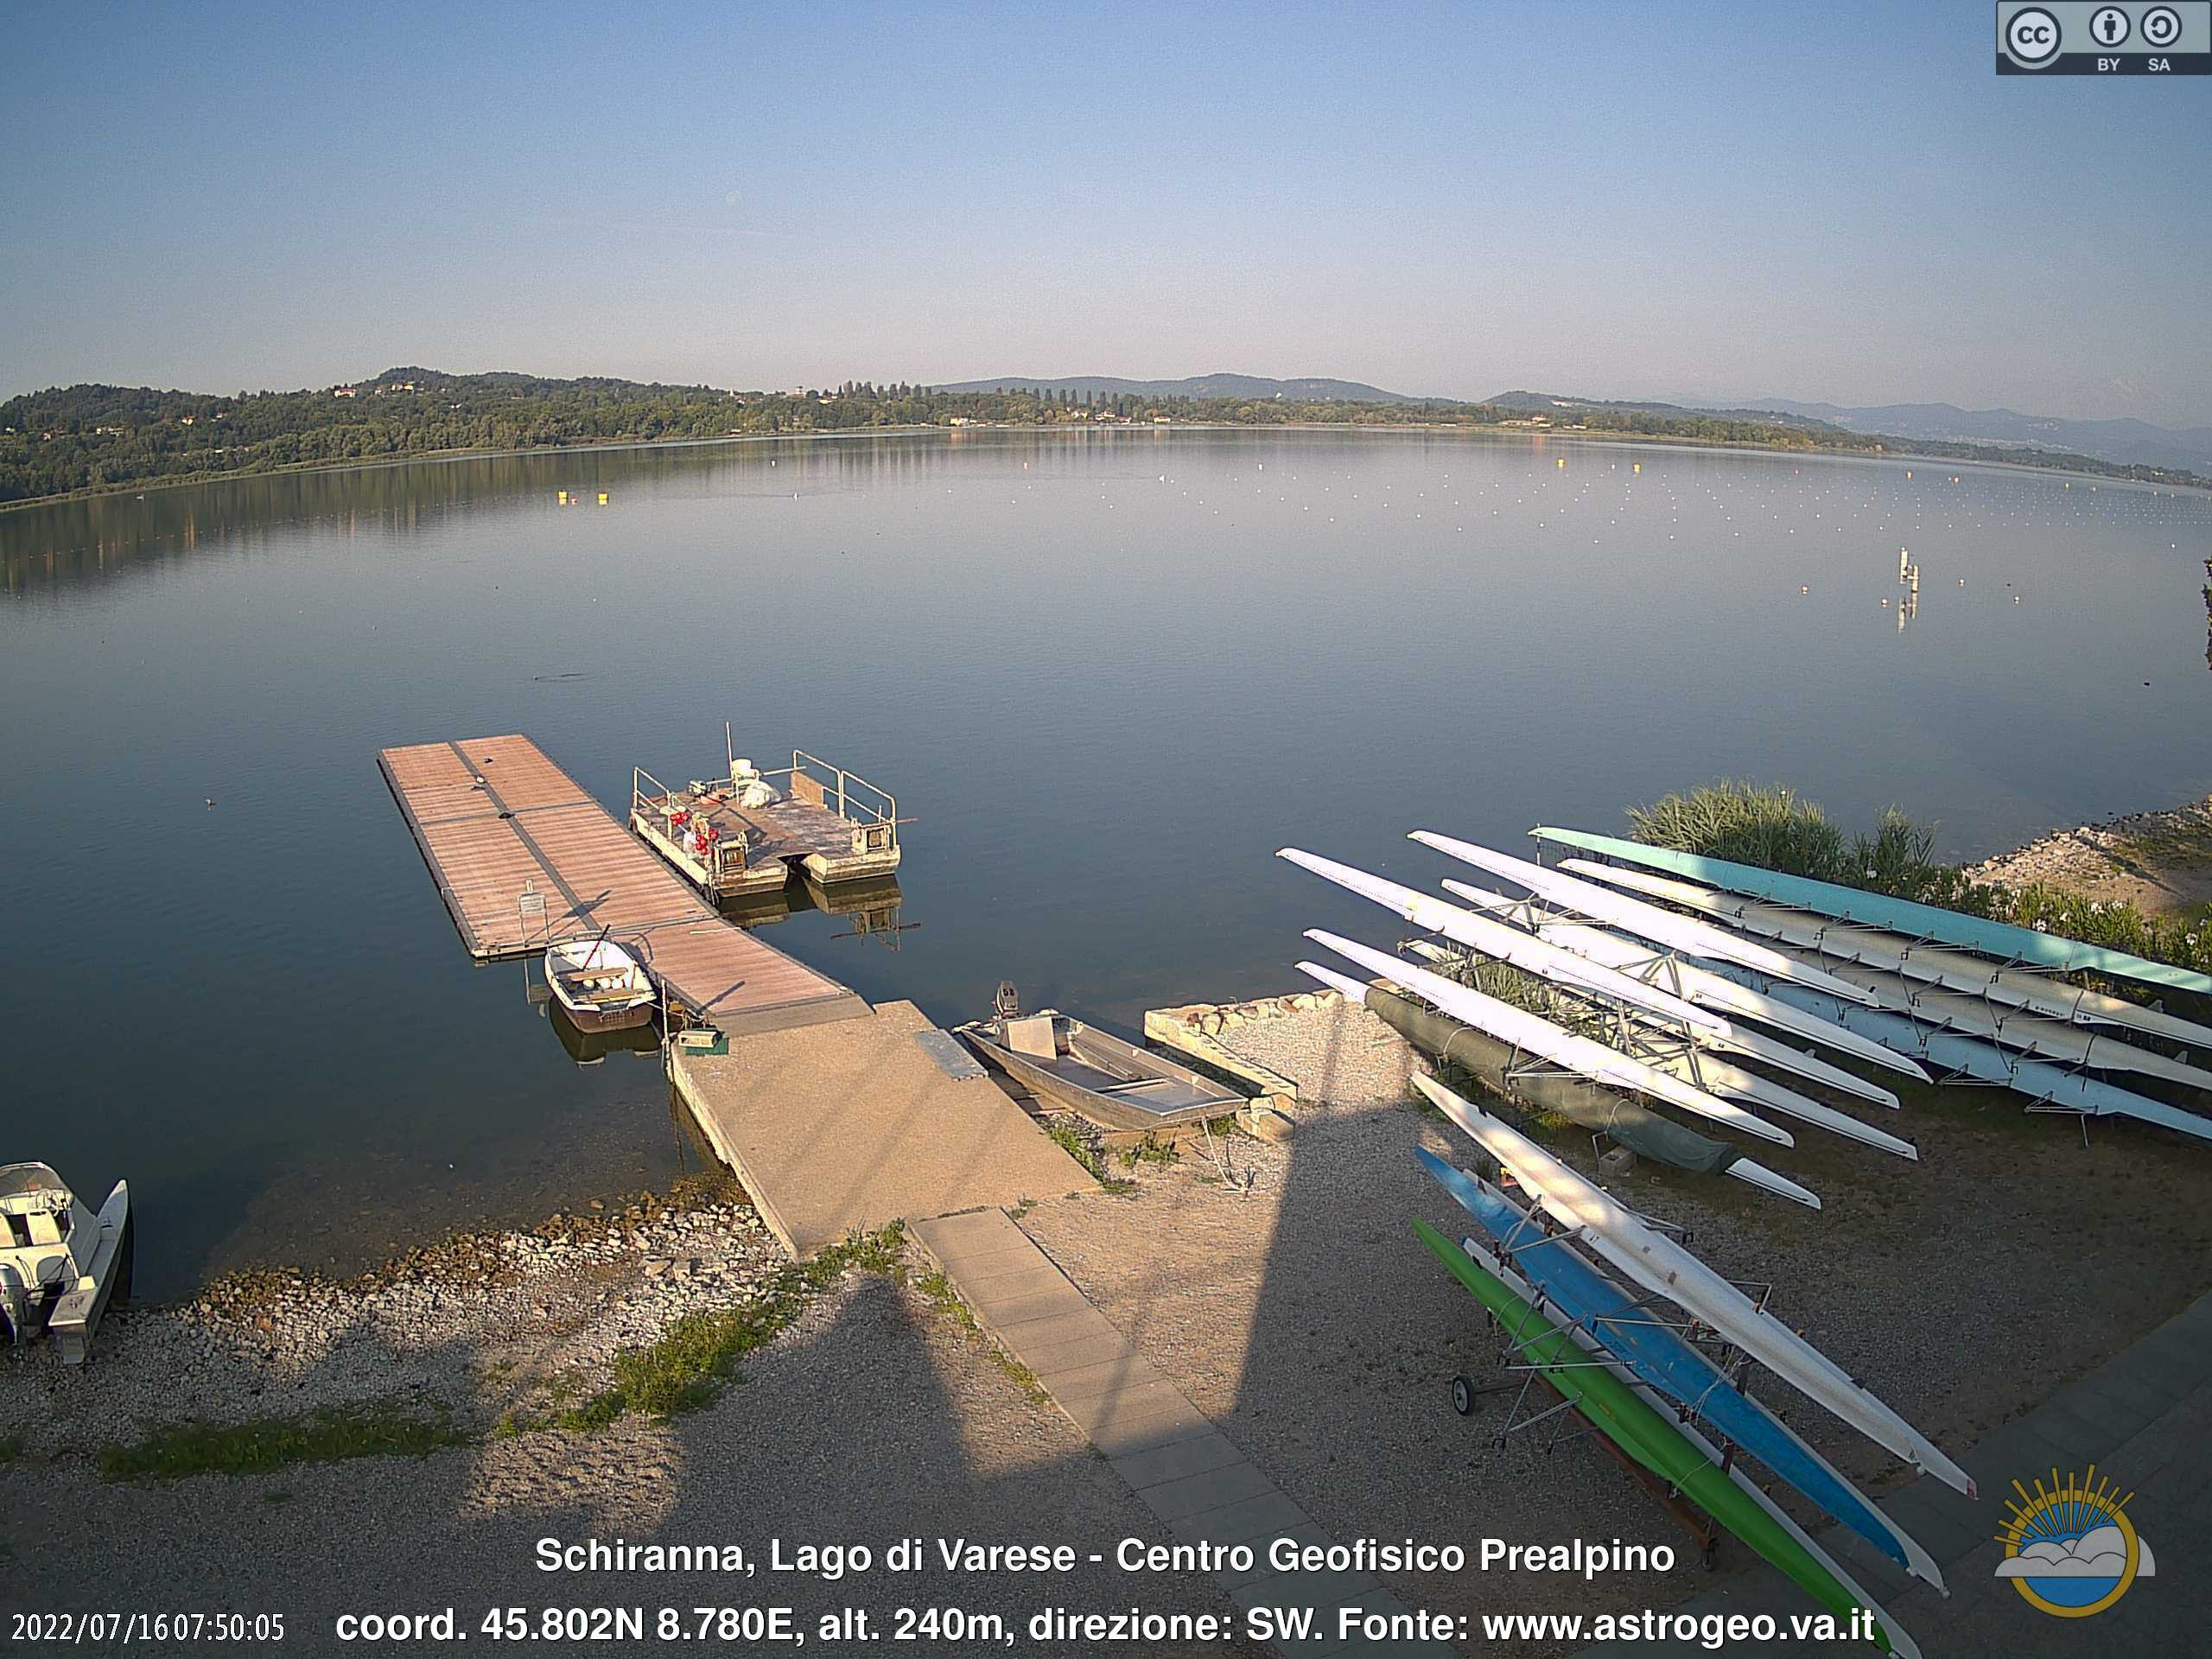 Varese - Schiranna